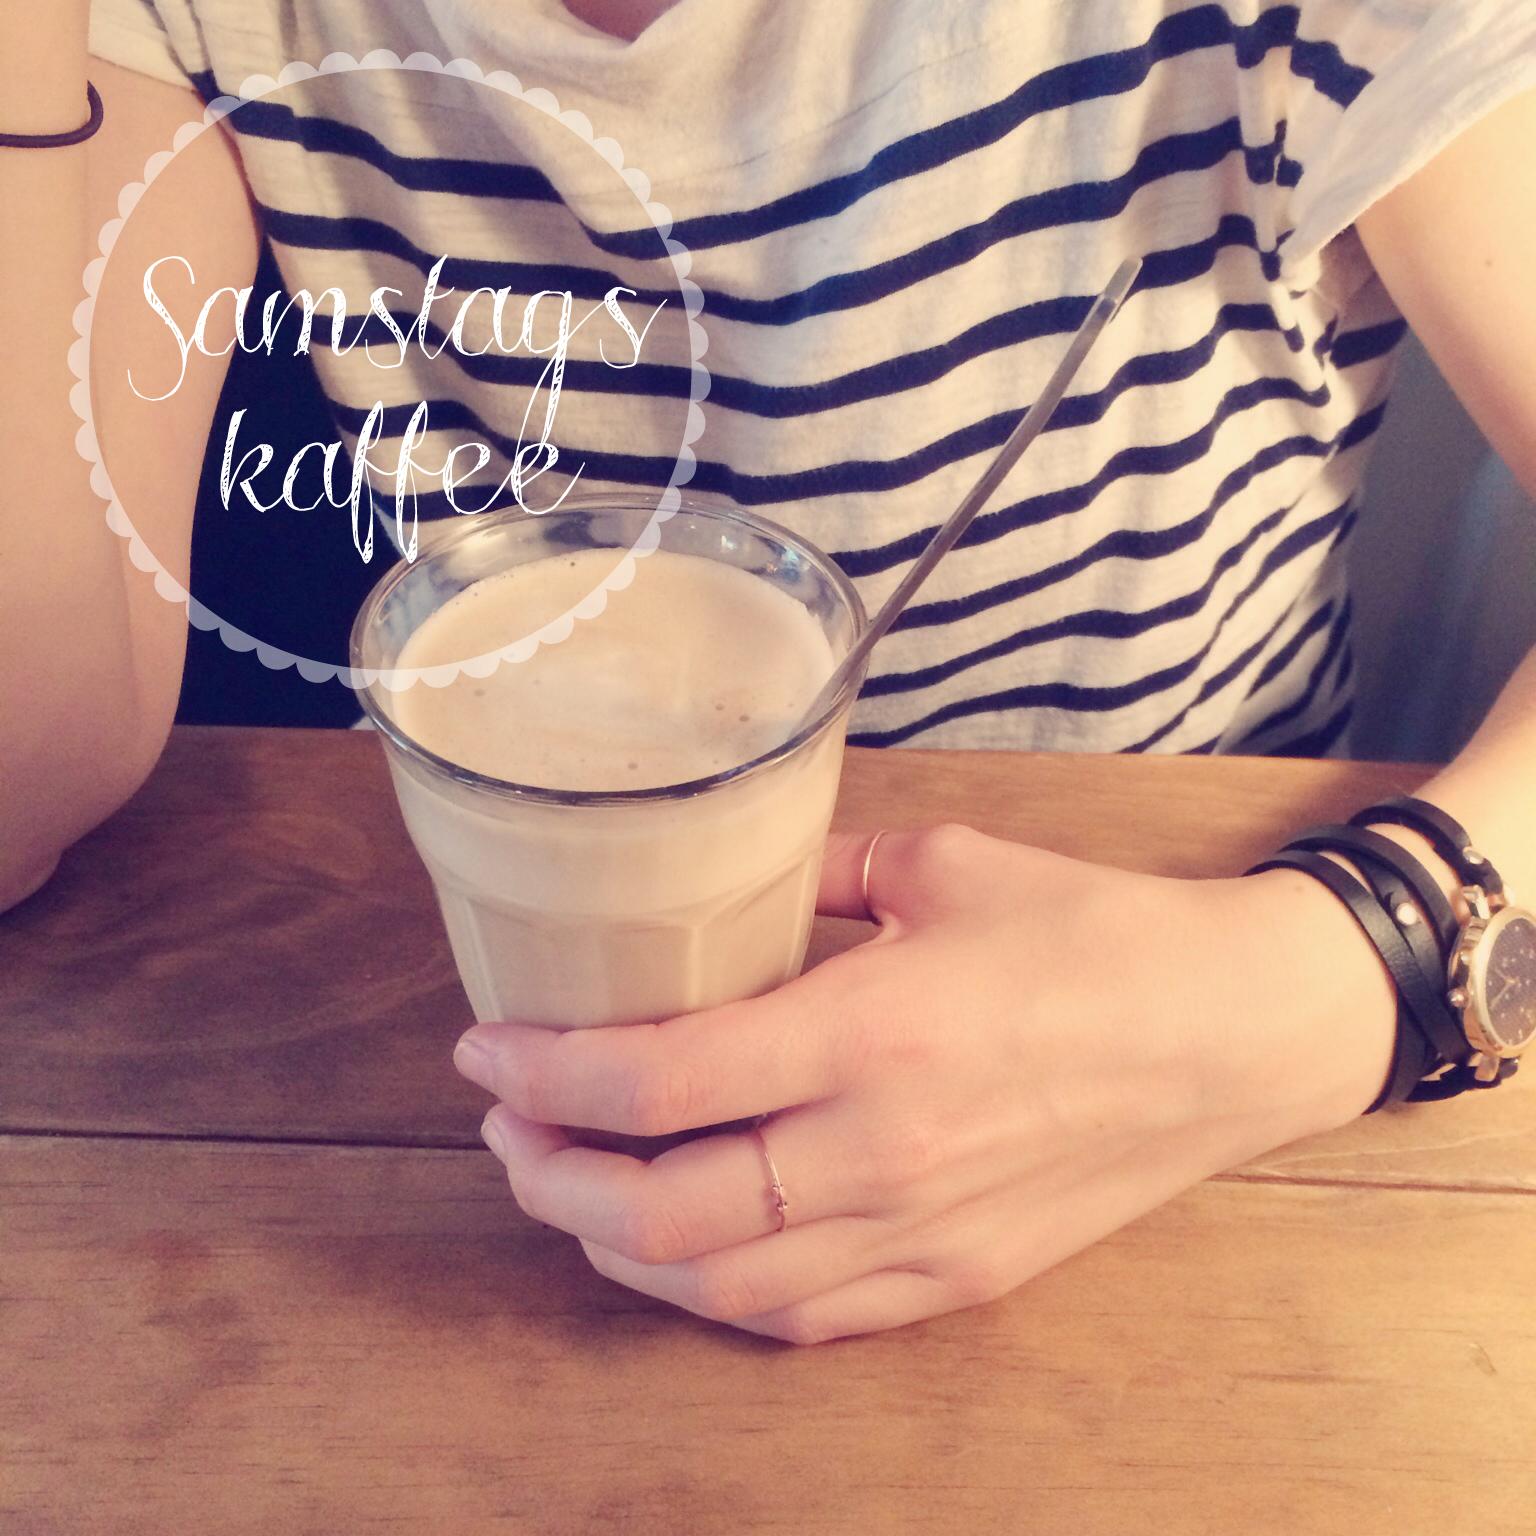 Samstagskaffee im Taubenschlag